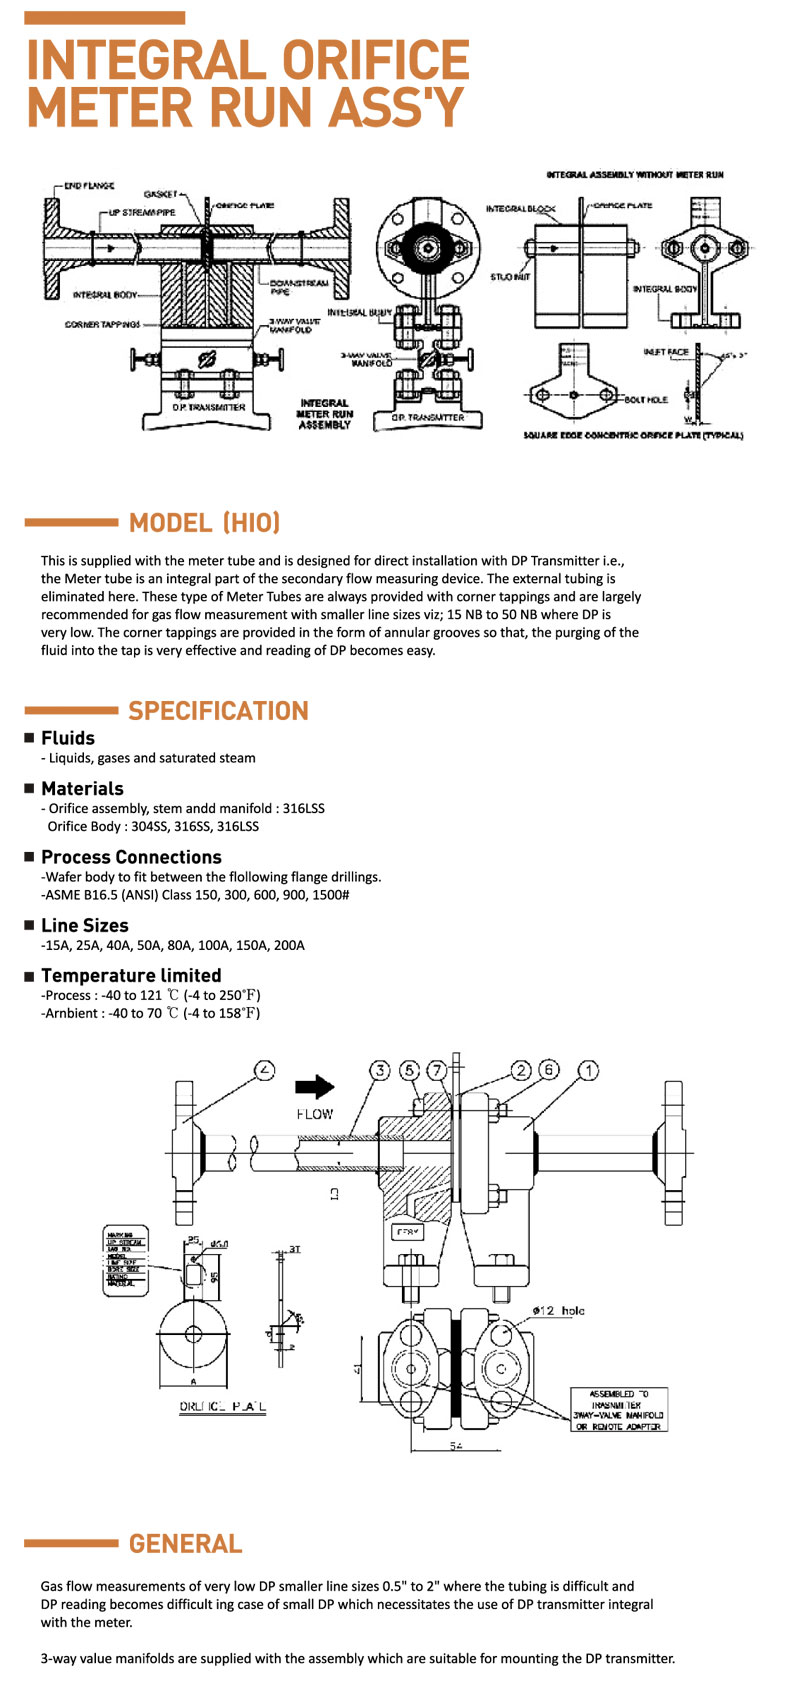 HITELFI Integral Orifice Meter Run Assemblies